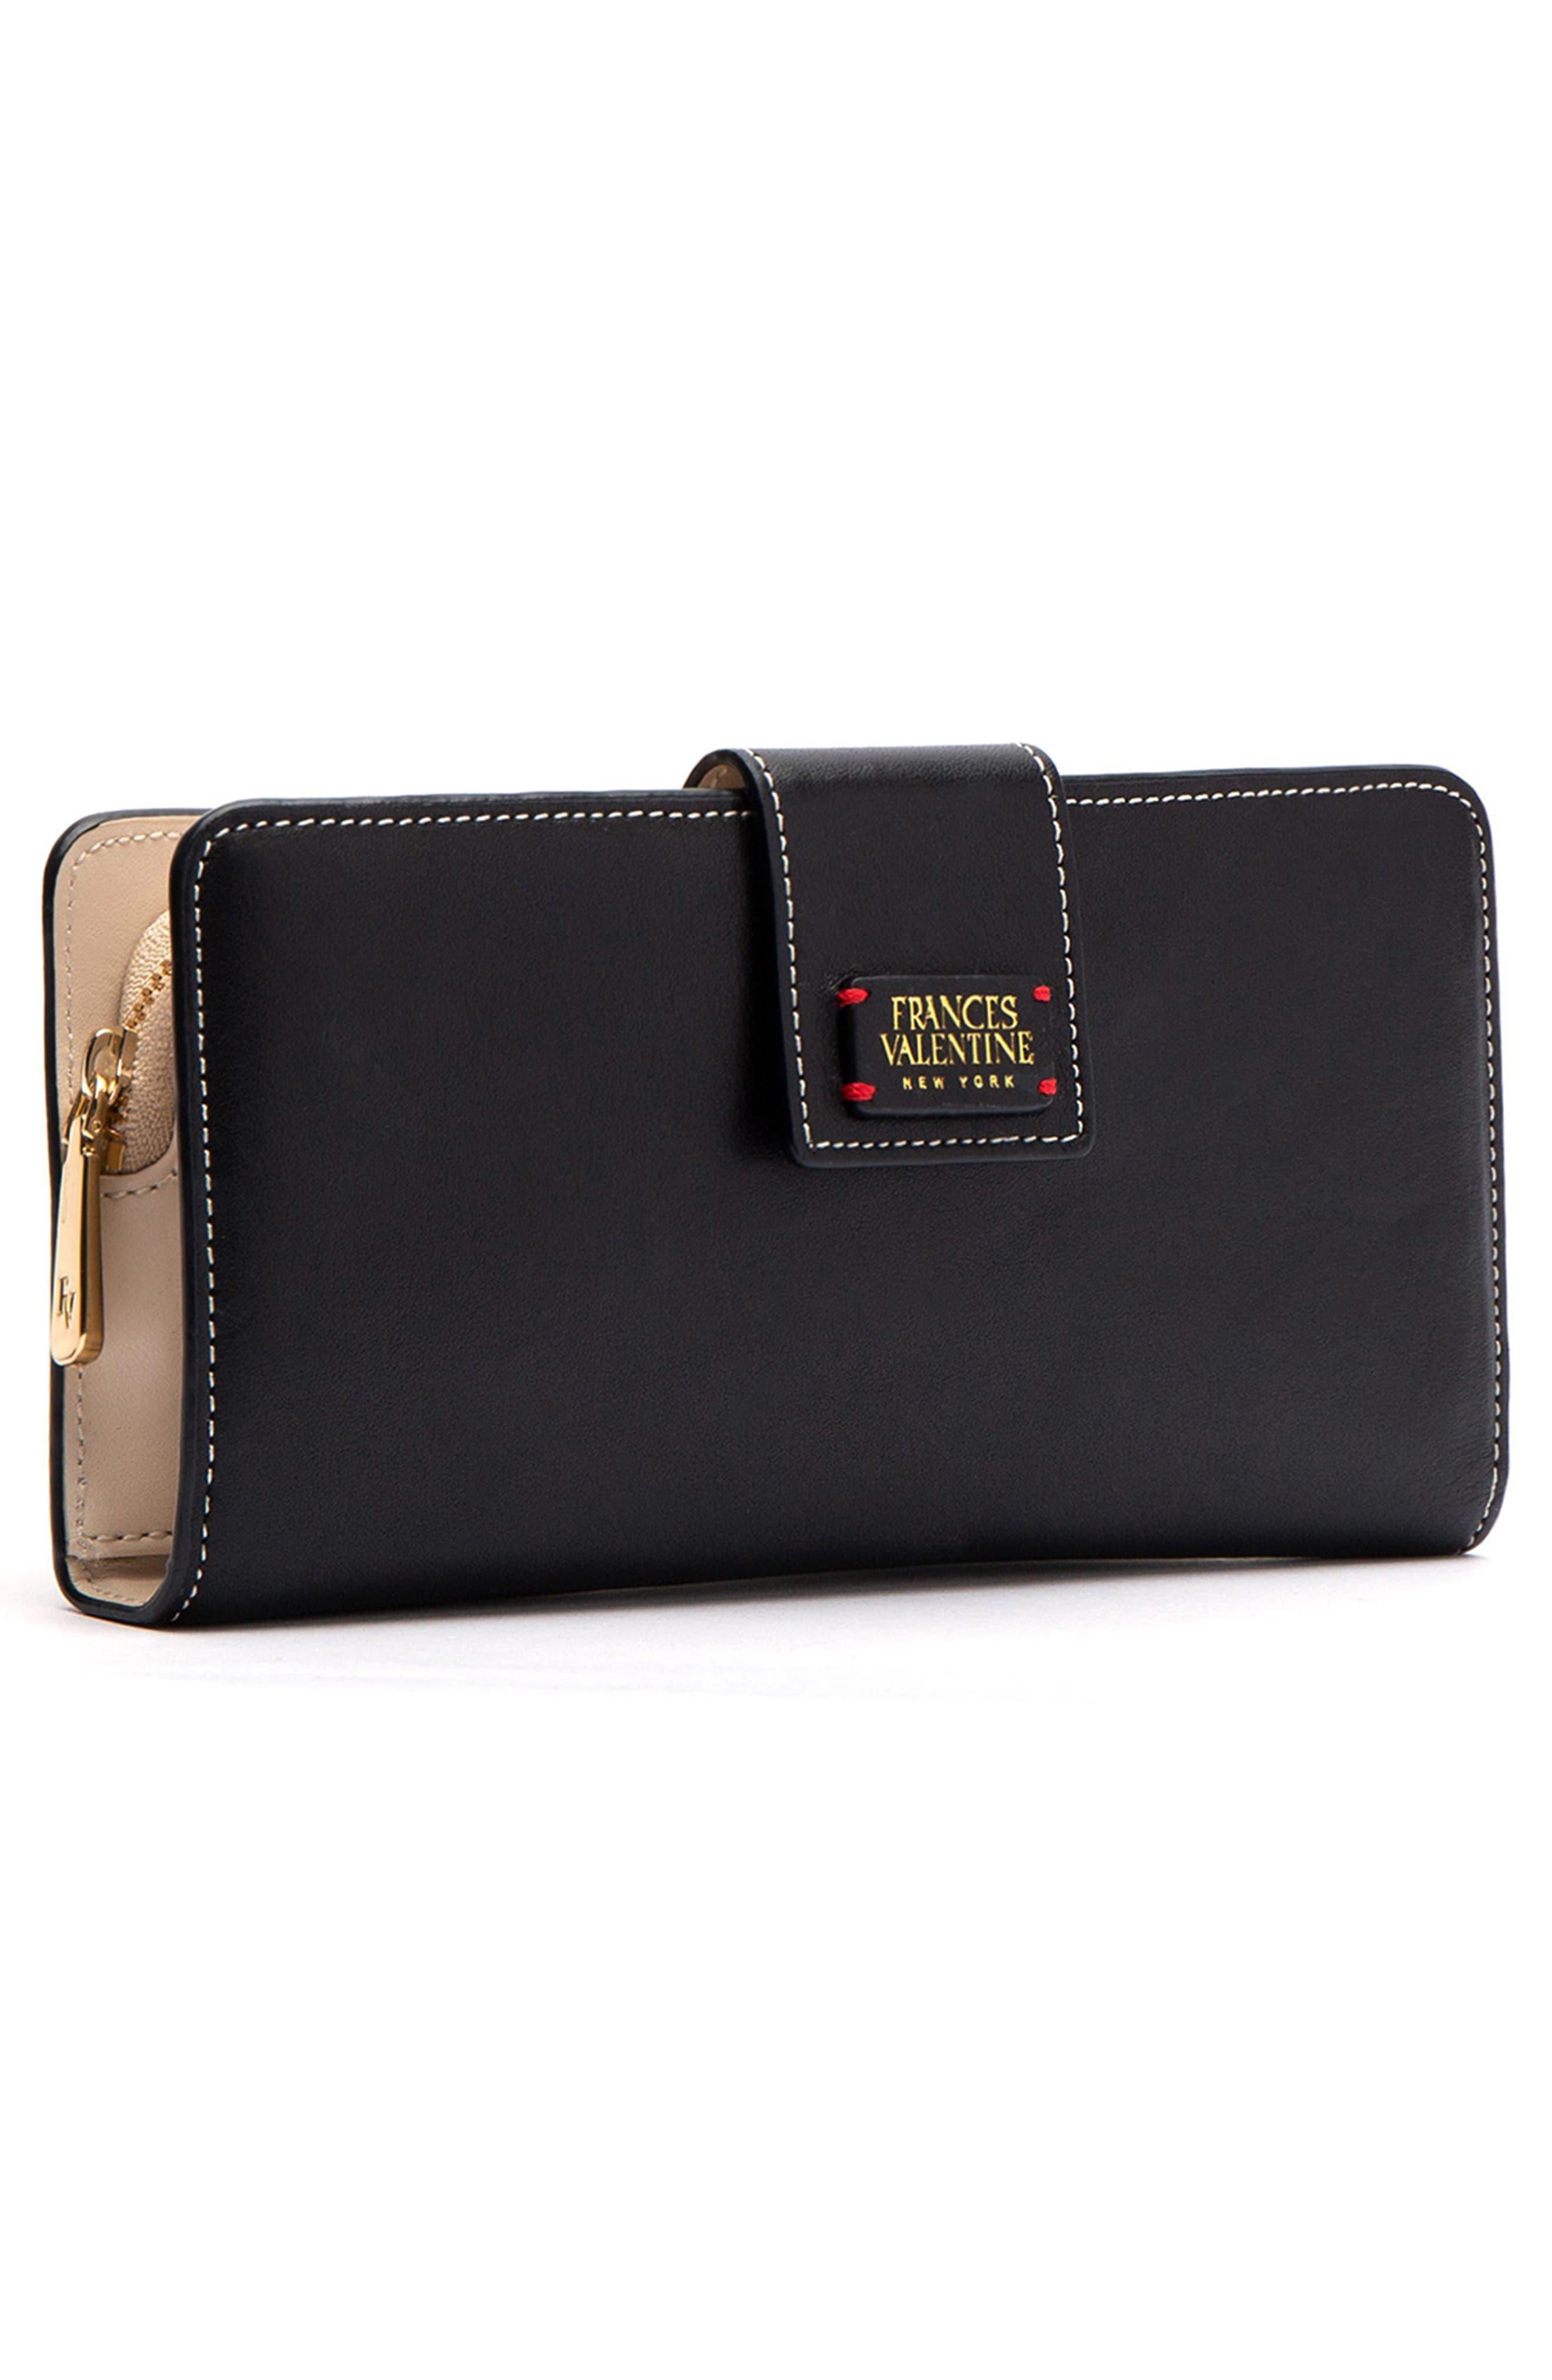 Jefferson Slim Calfskin Leather Wallet,                             Alternate thumbnail 3, color,                             BLACK/ OYSTER